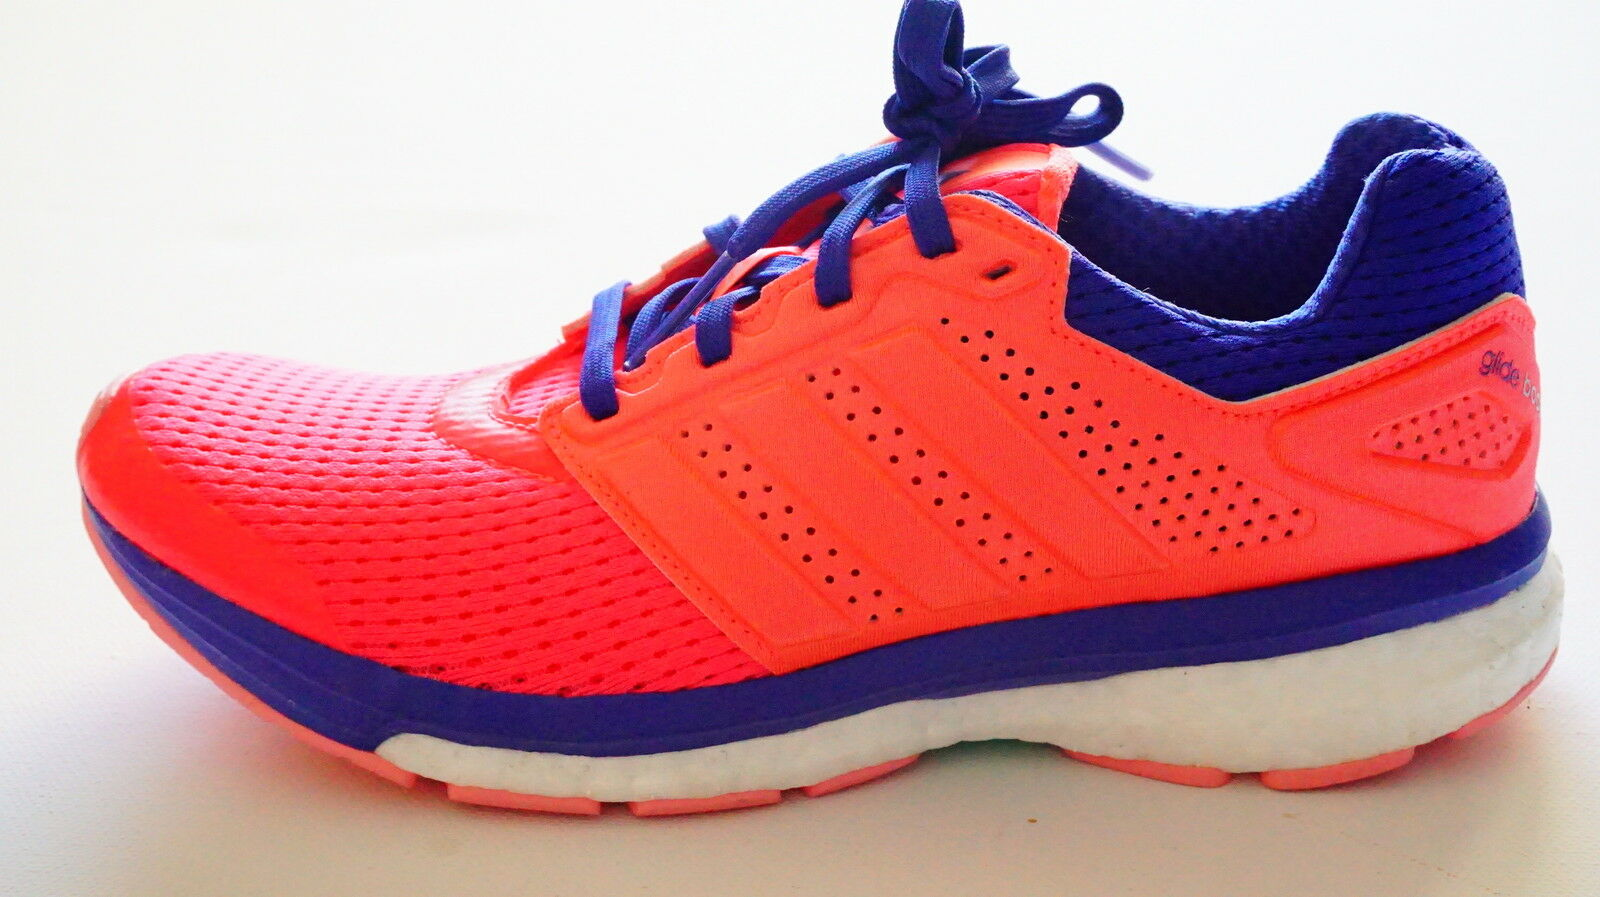 Adidas Supernova glide boost 7 Fitness Damen Laufschuhe, Rosa Sneakers Fitness 7 Schuhe 7eb9c4